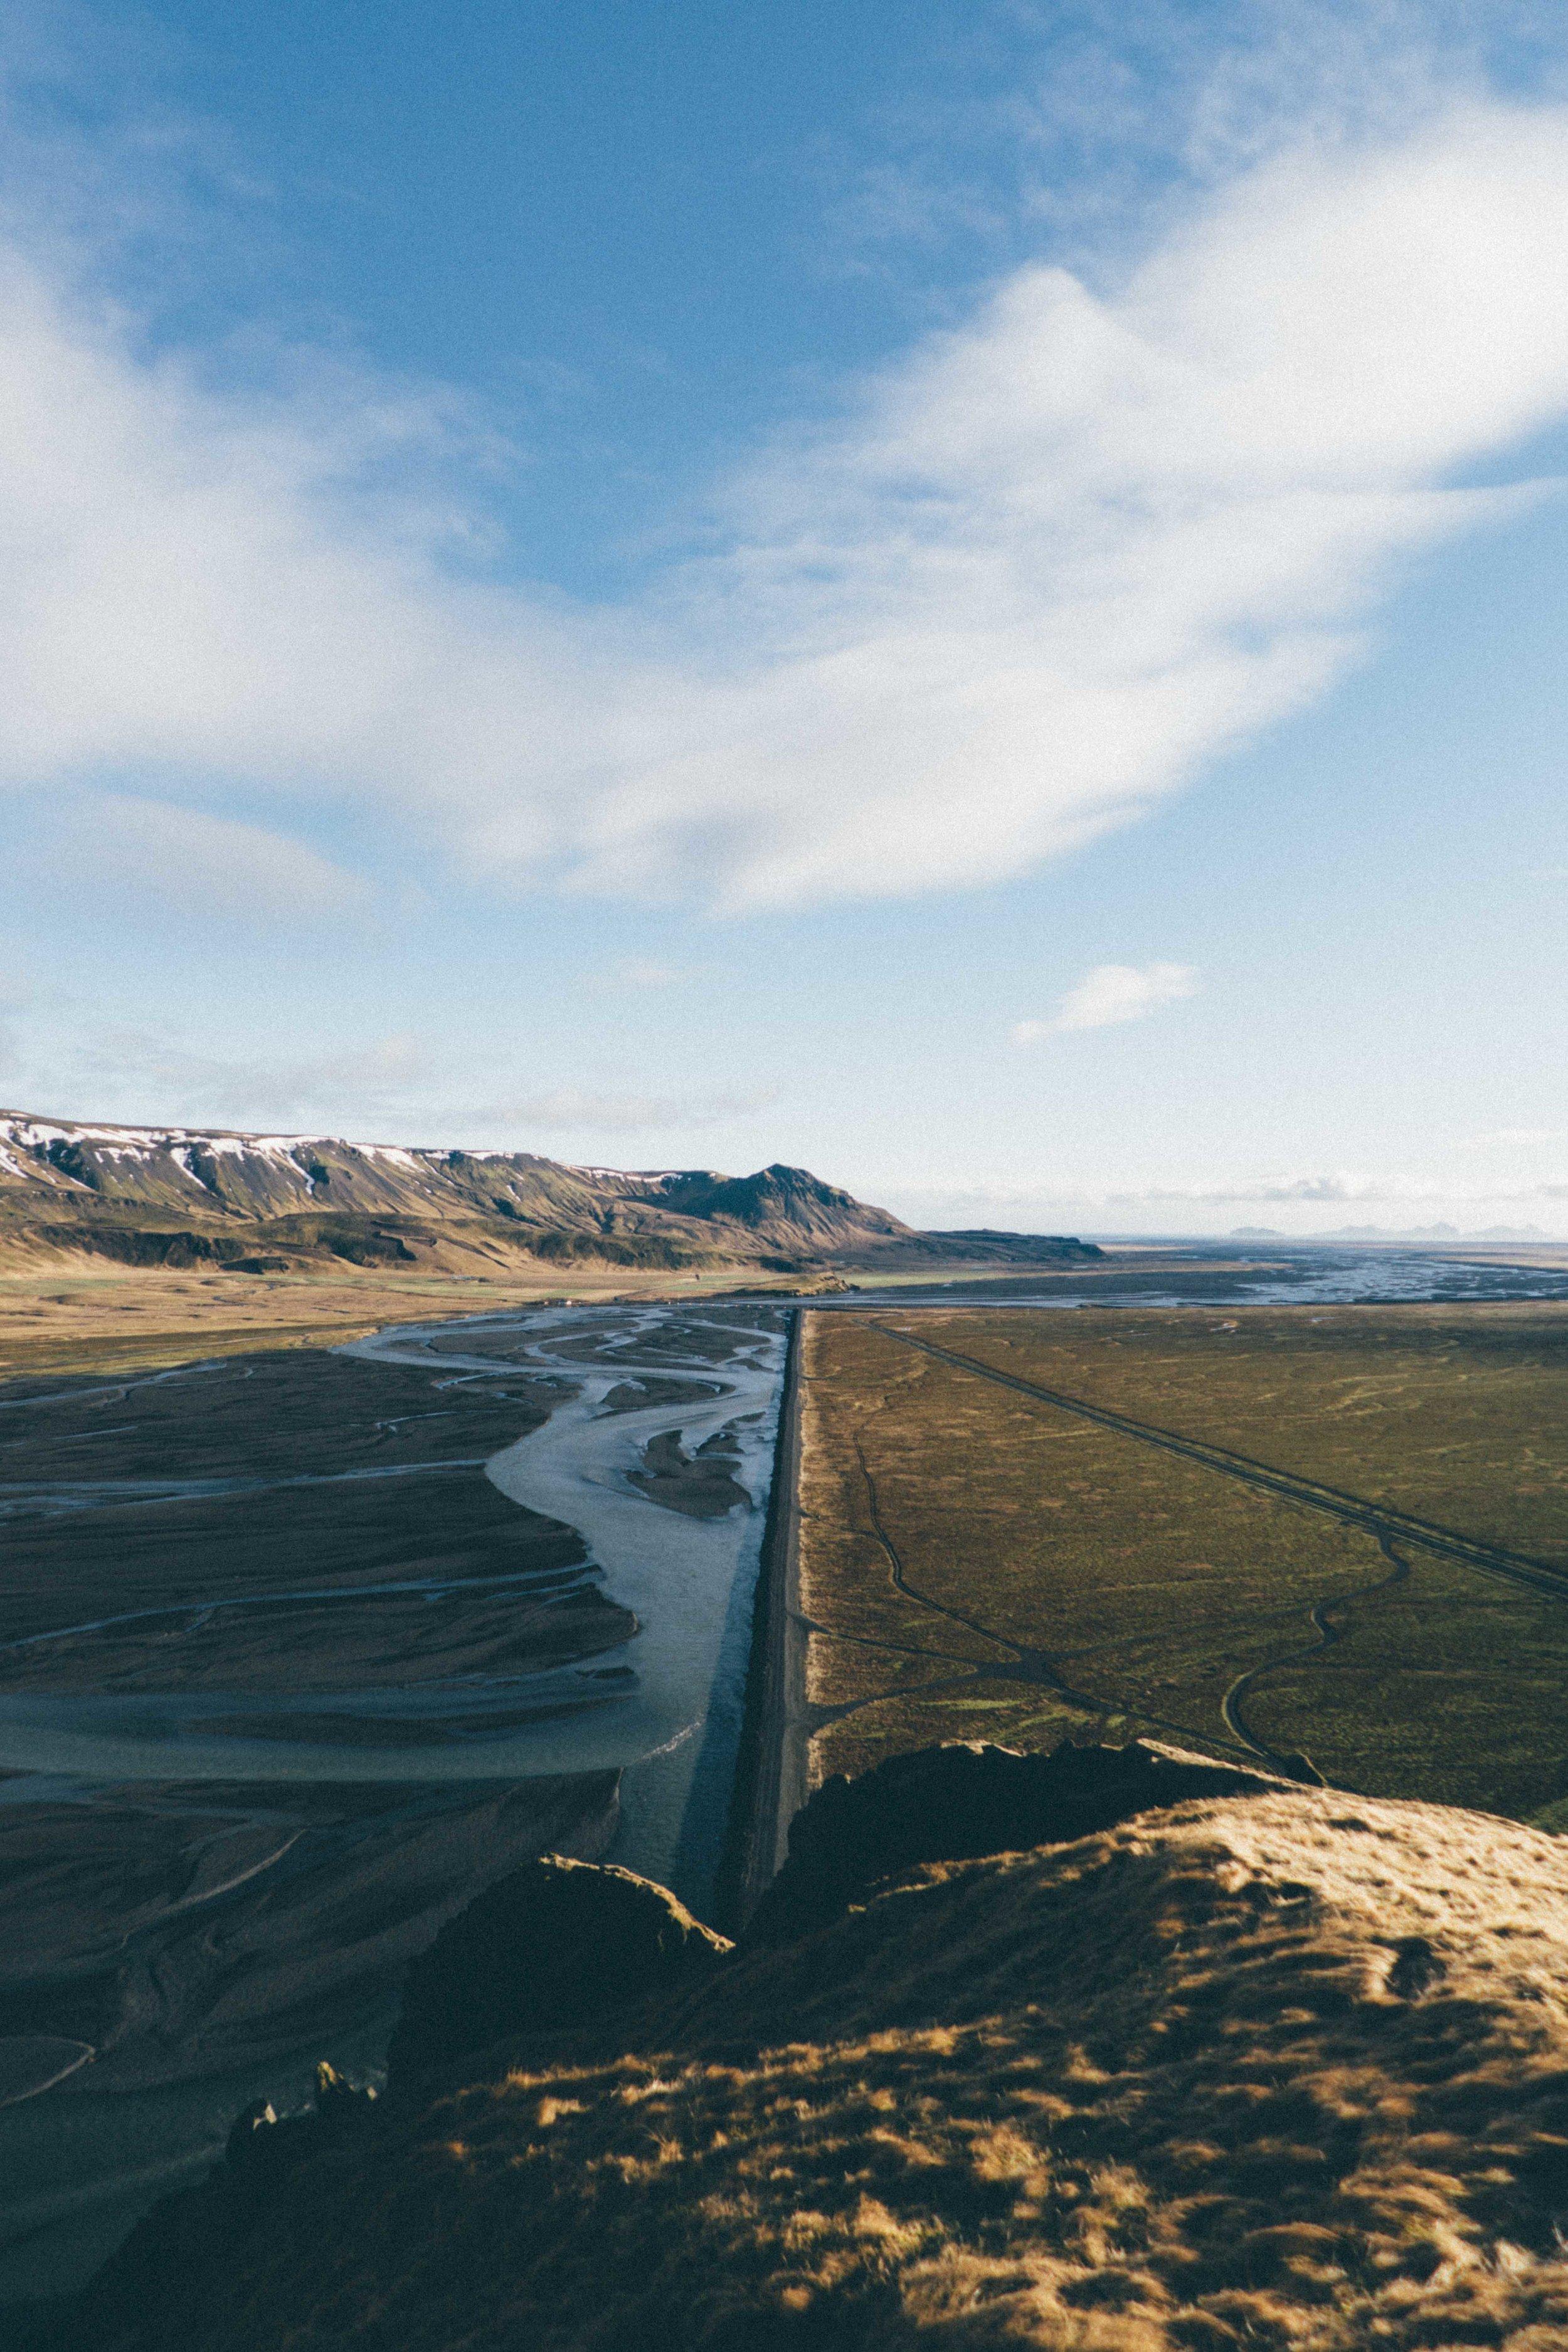 Locations - ReykjavikKleifarvatn LakeSeljalandsfoss WaterfallSeljavallalung Swimming PoolDyrholaey Light house & BeachHruni Hot PotKirkjufell MountainPlus super secret locations!